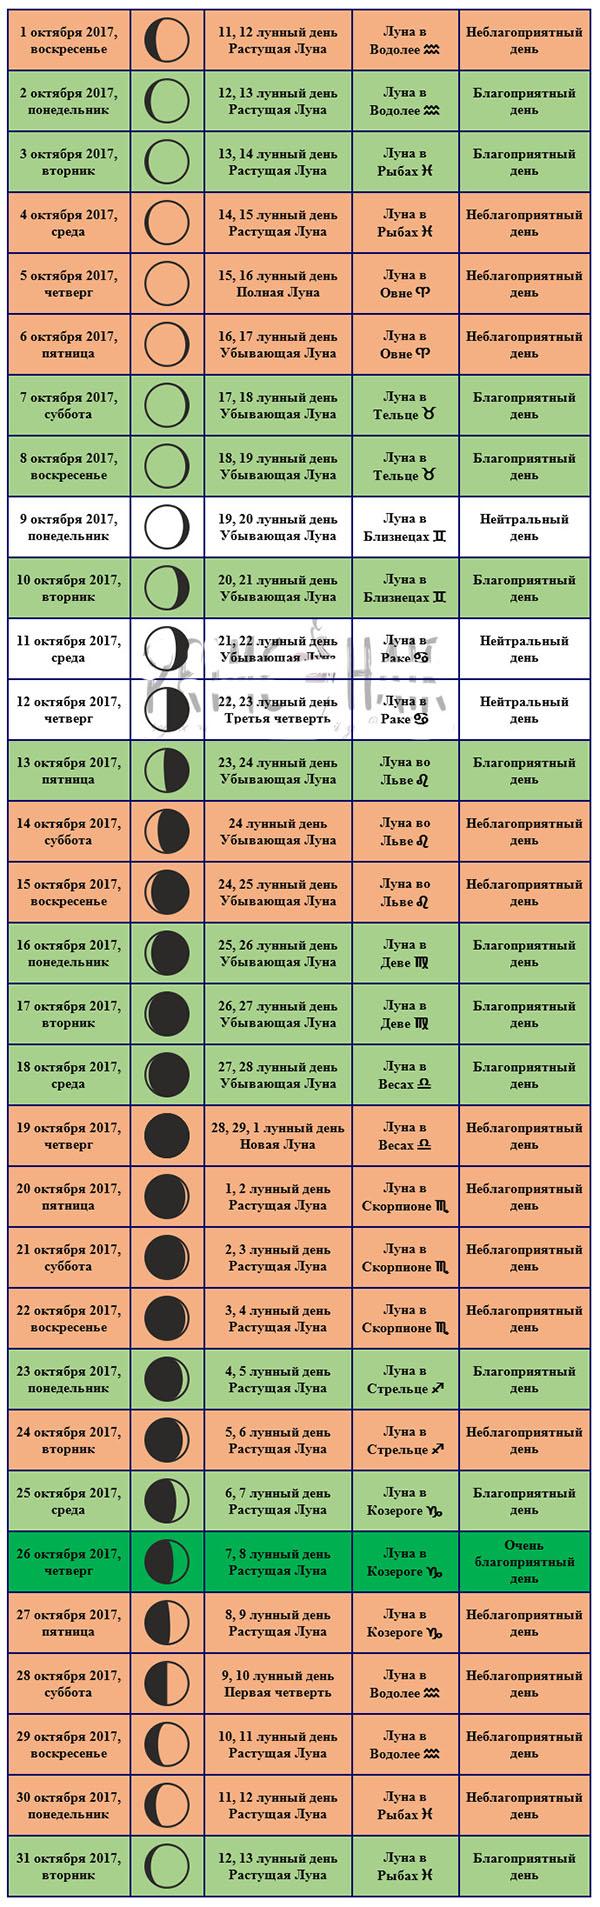 Лунная Диета Для Женщин По Лунному Календарю. Лунный календарь питания